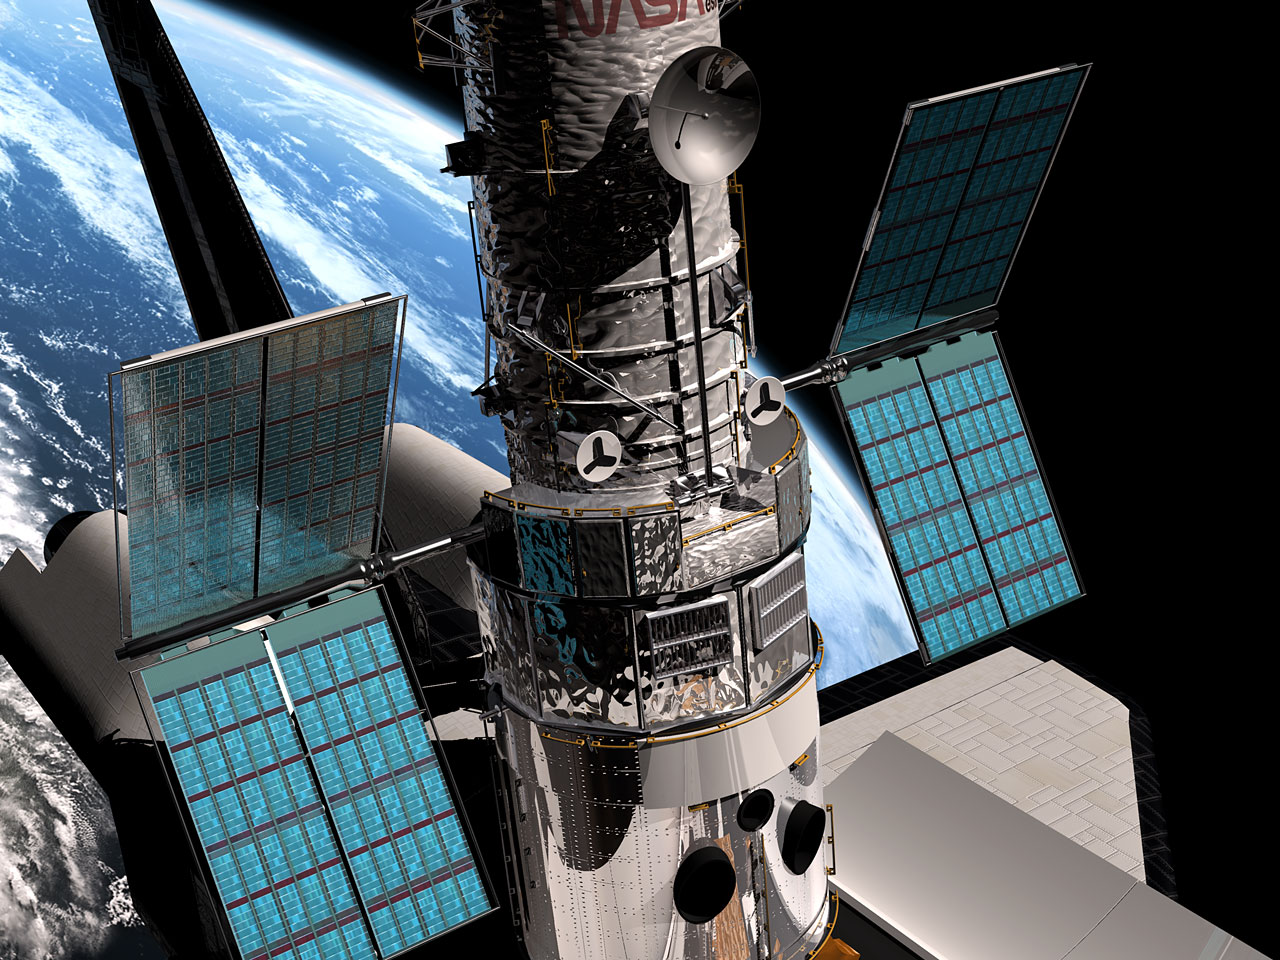 ranger spacecraft solar panels - photo #19